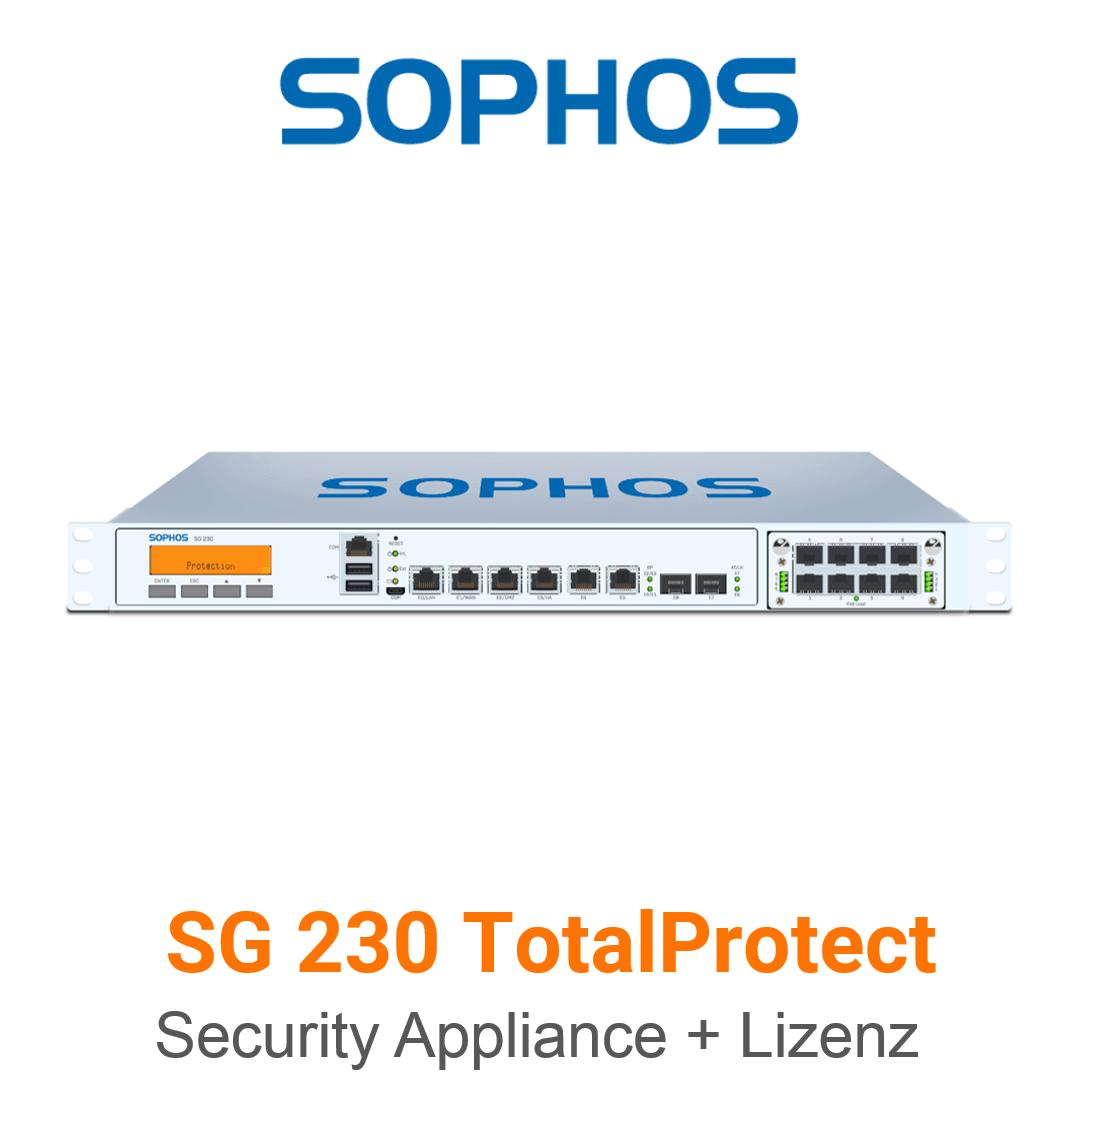 Sophos SG 230 TotalProtect Bundle (Hardware + Lizenz)